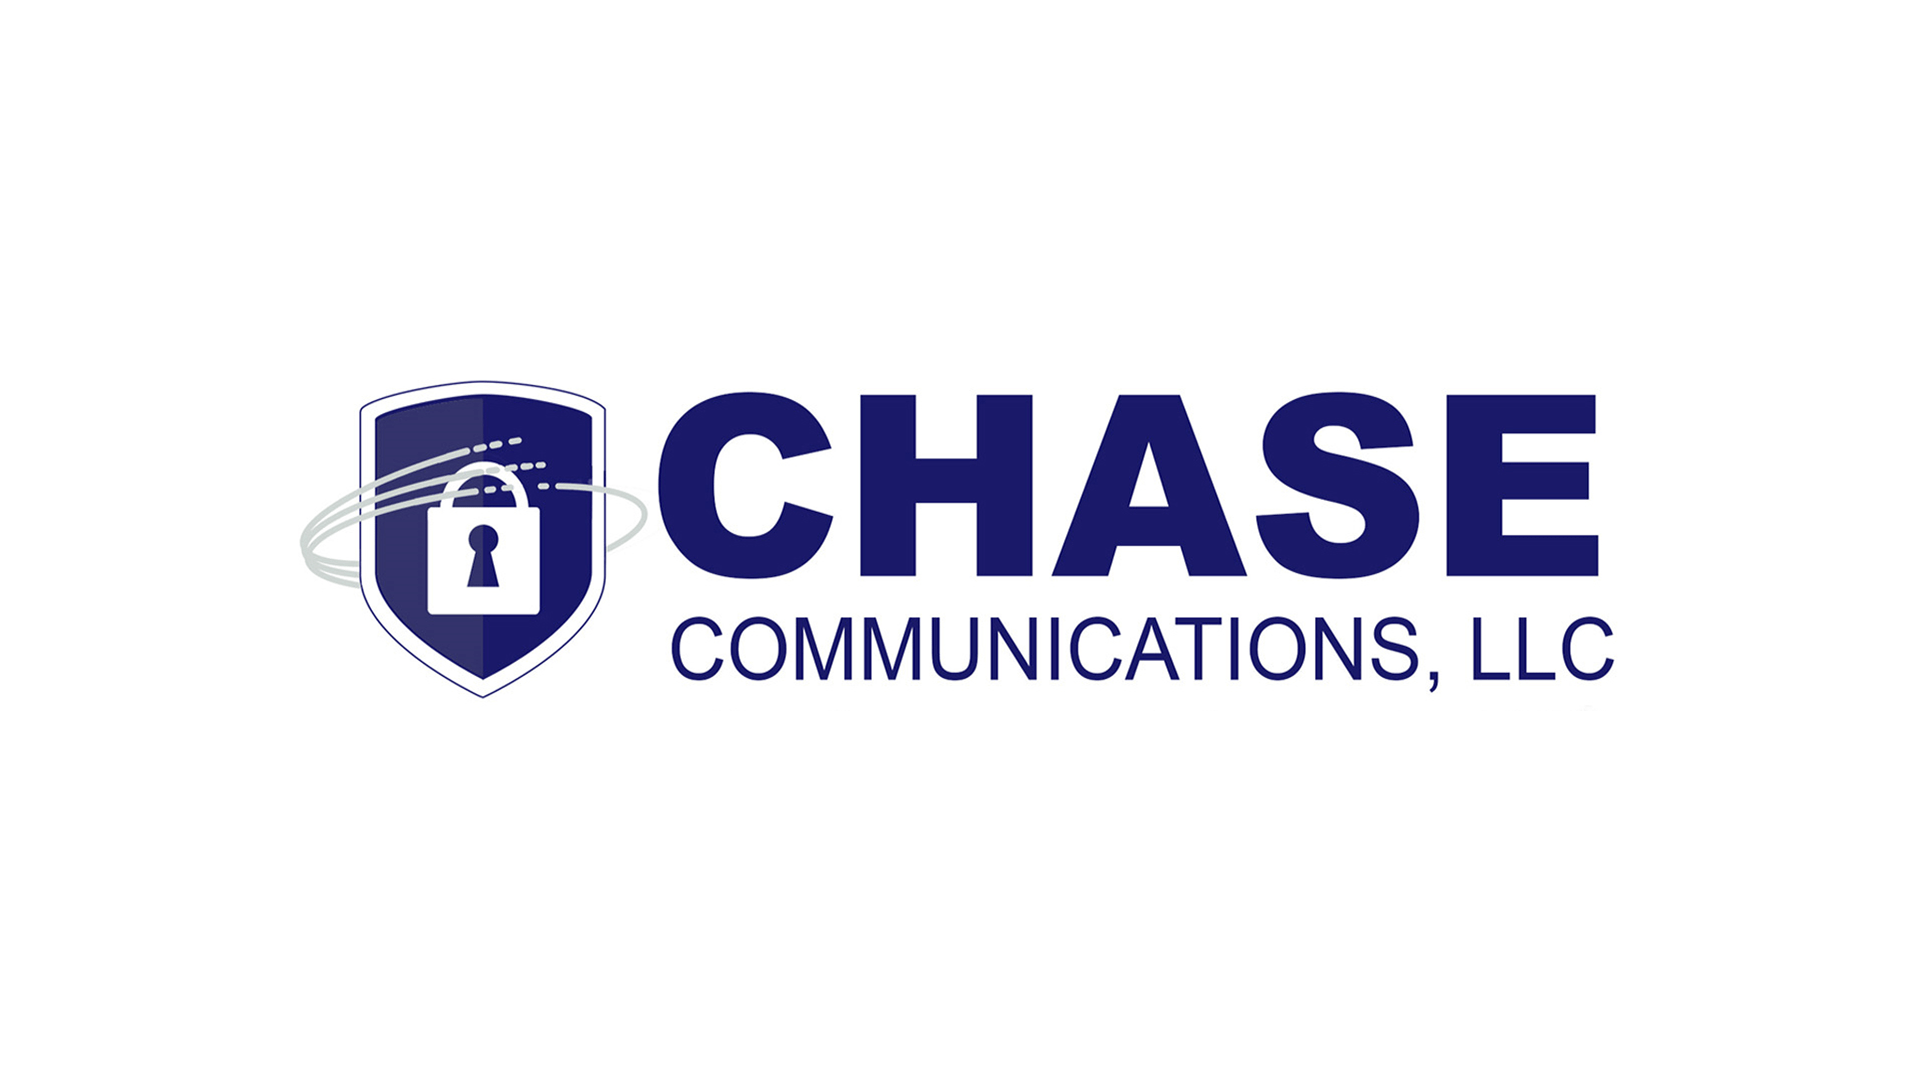 Chase Communications LLC